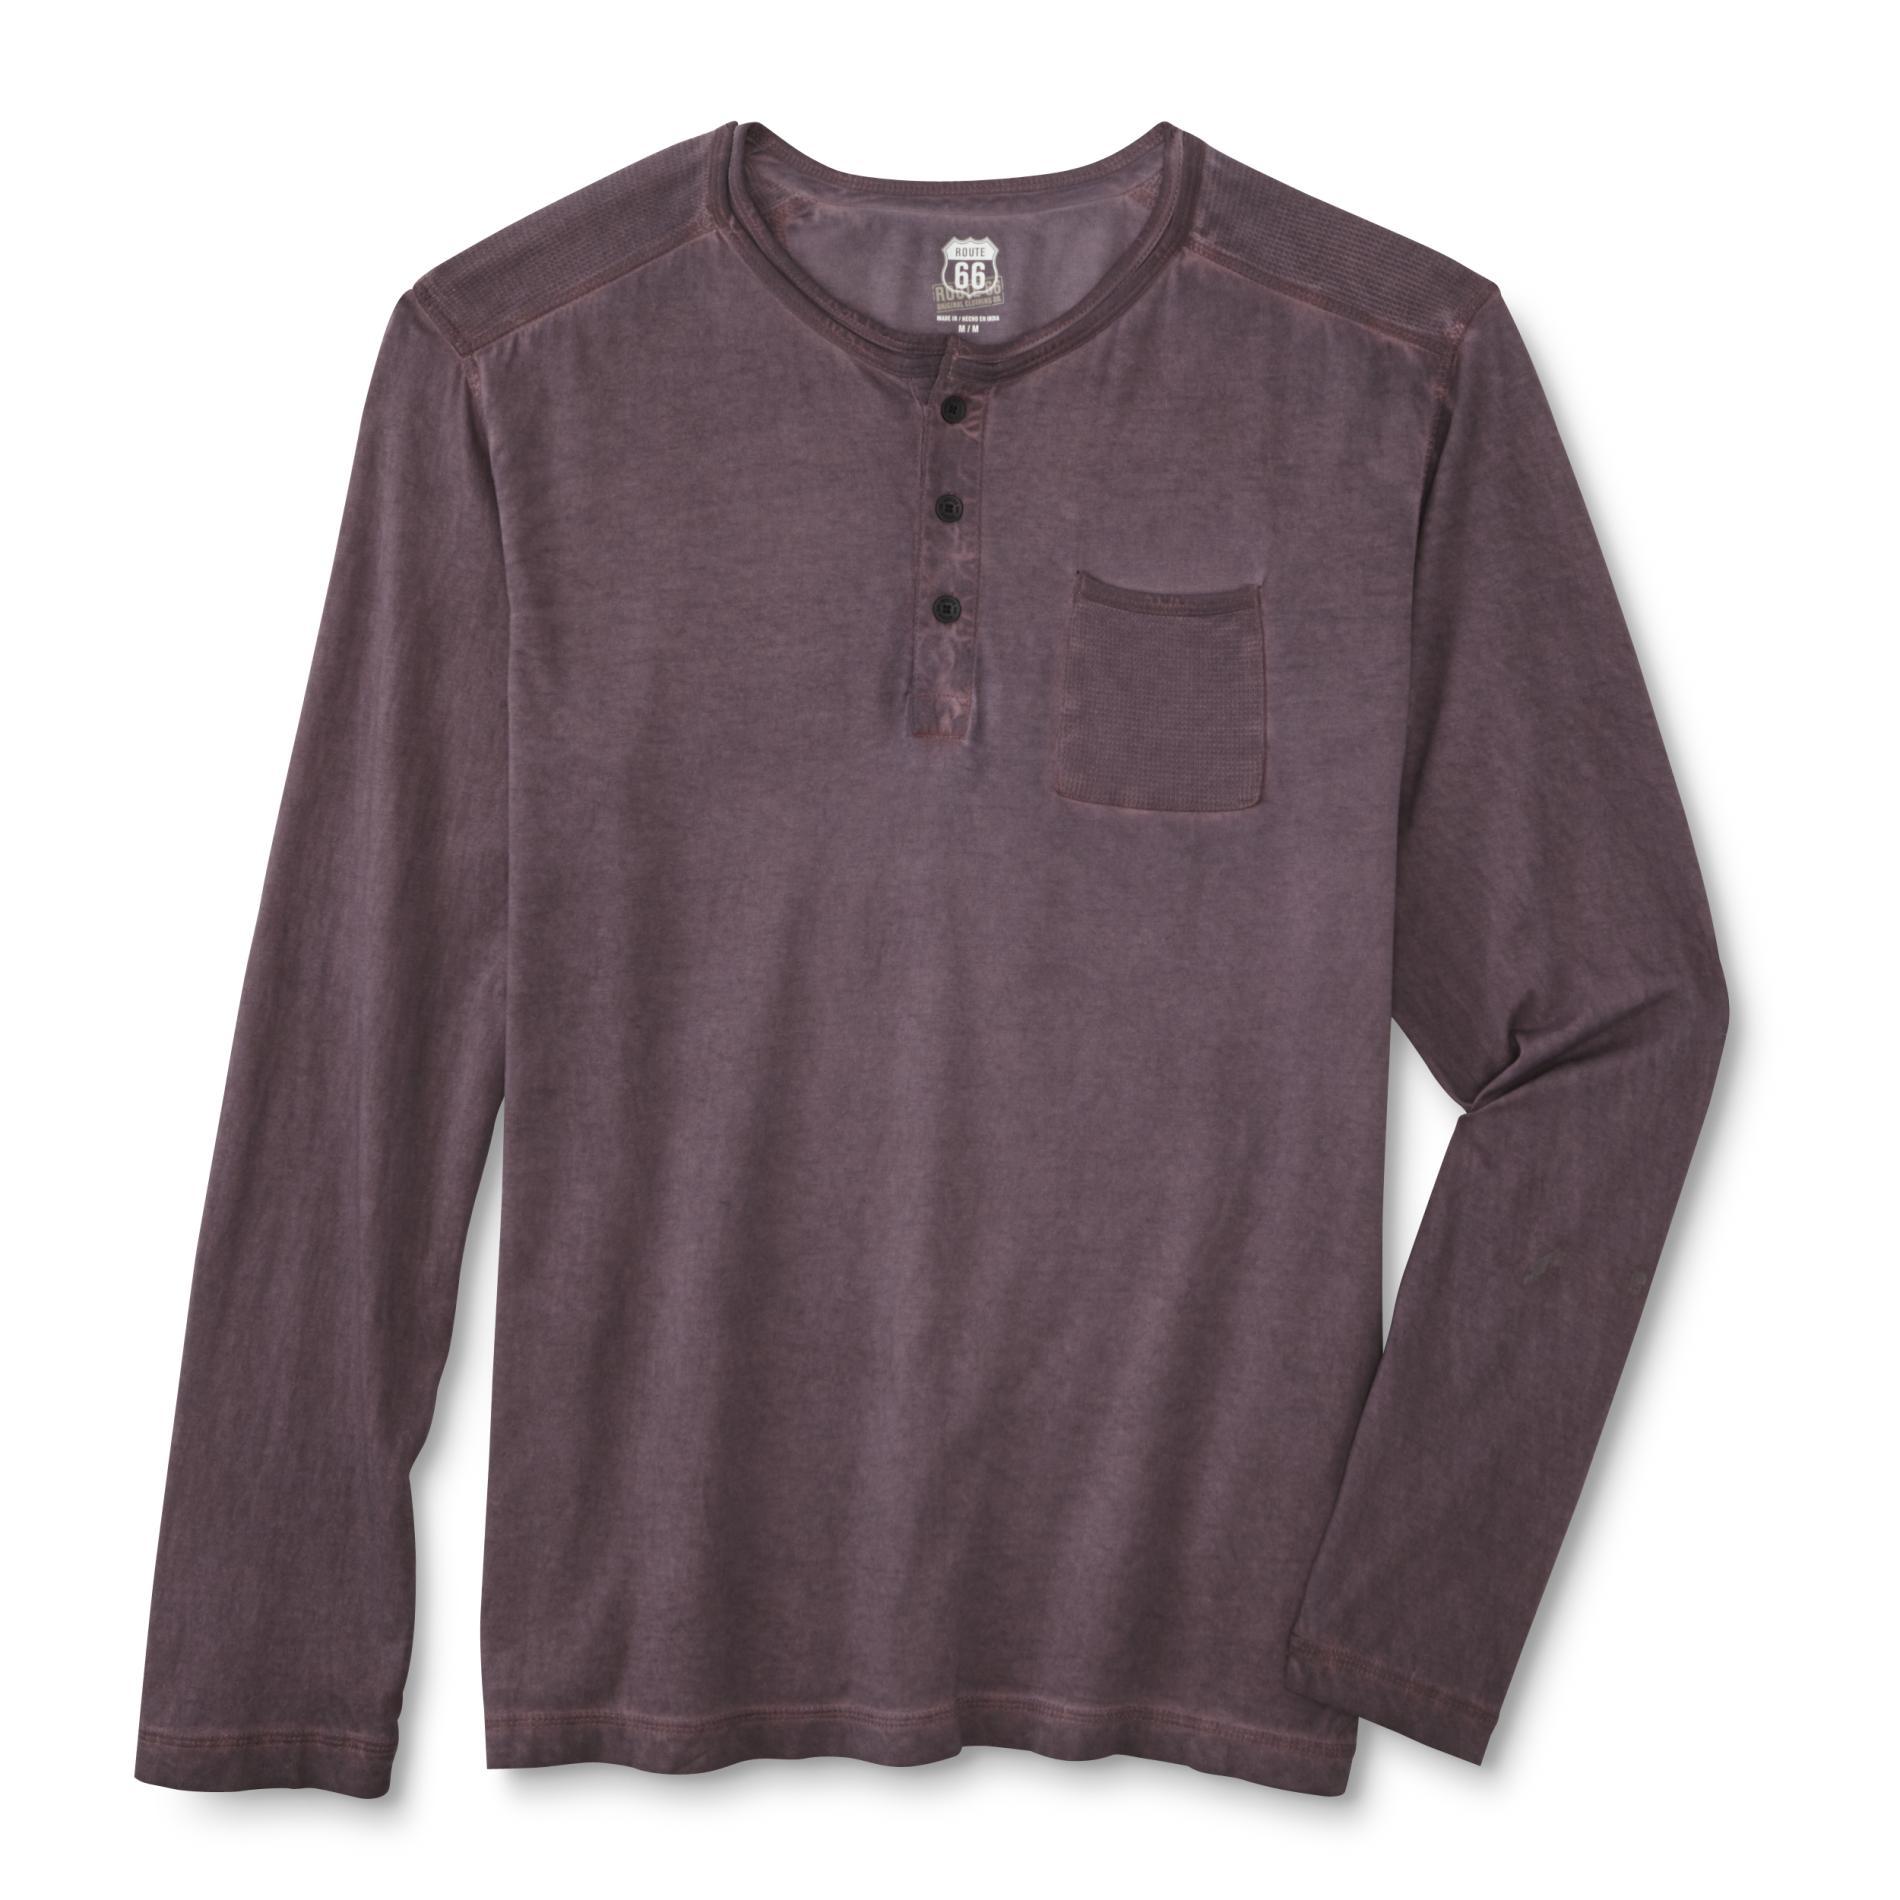 Route 66 Men's Henley Shirt